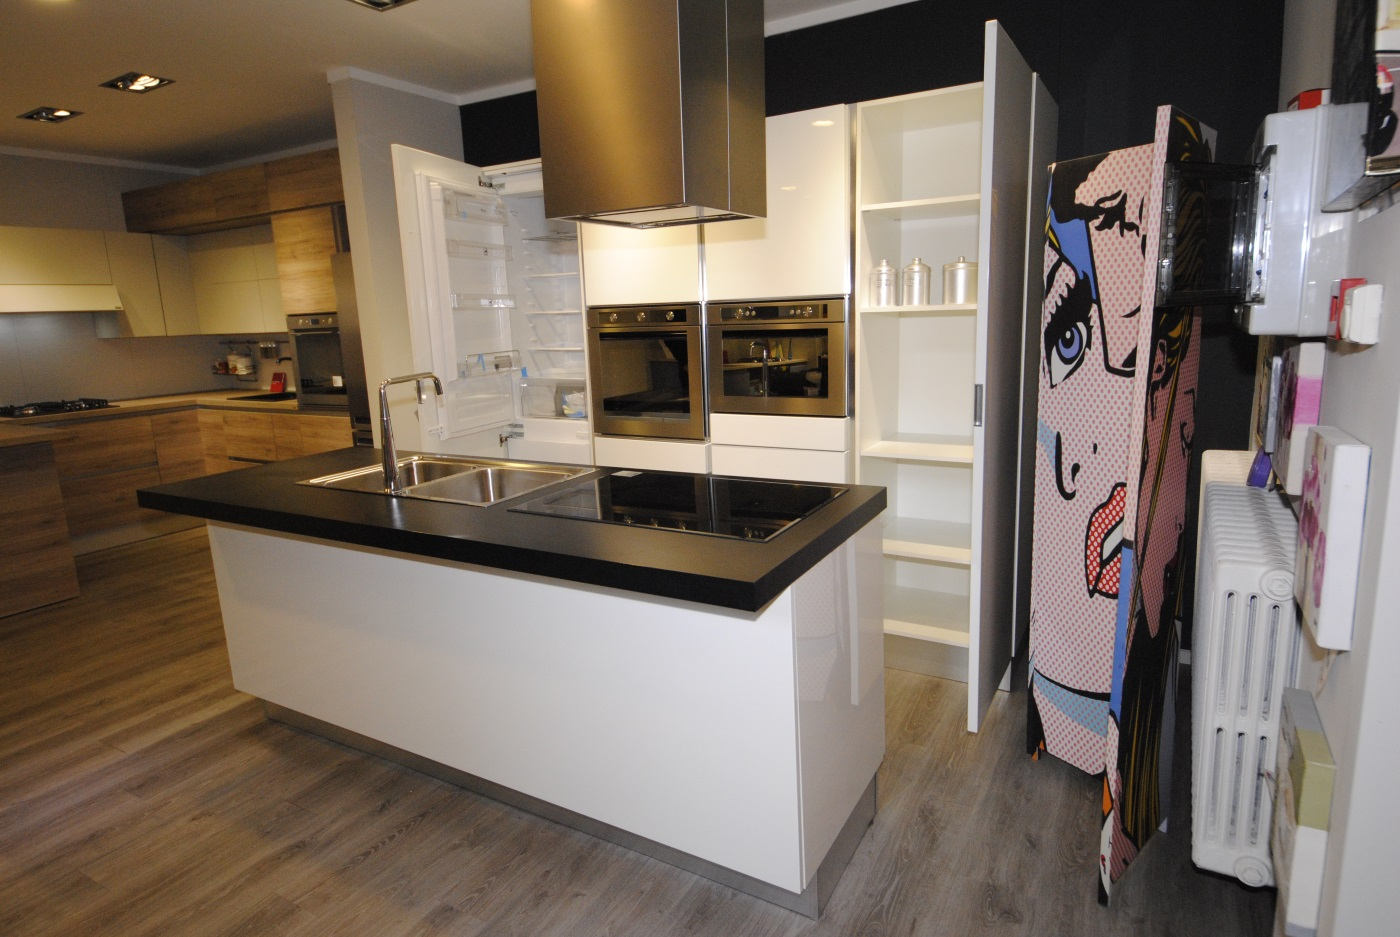 Emejing Cucina Scenery Scavolini Prezzo Ideas - Orna.info - orna.info